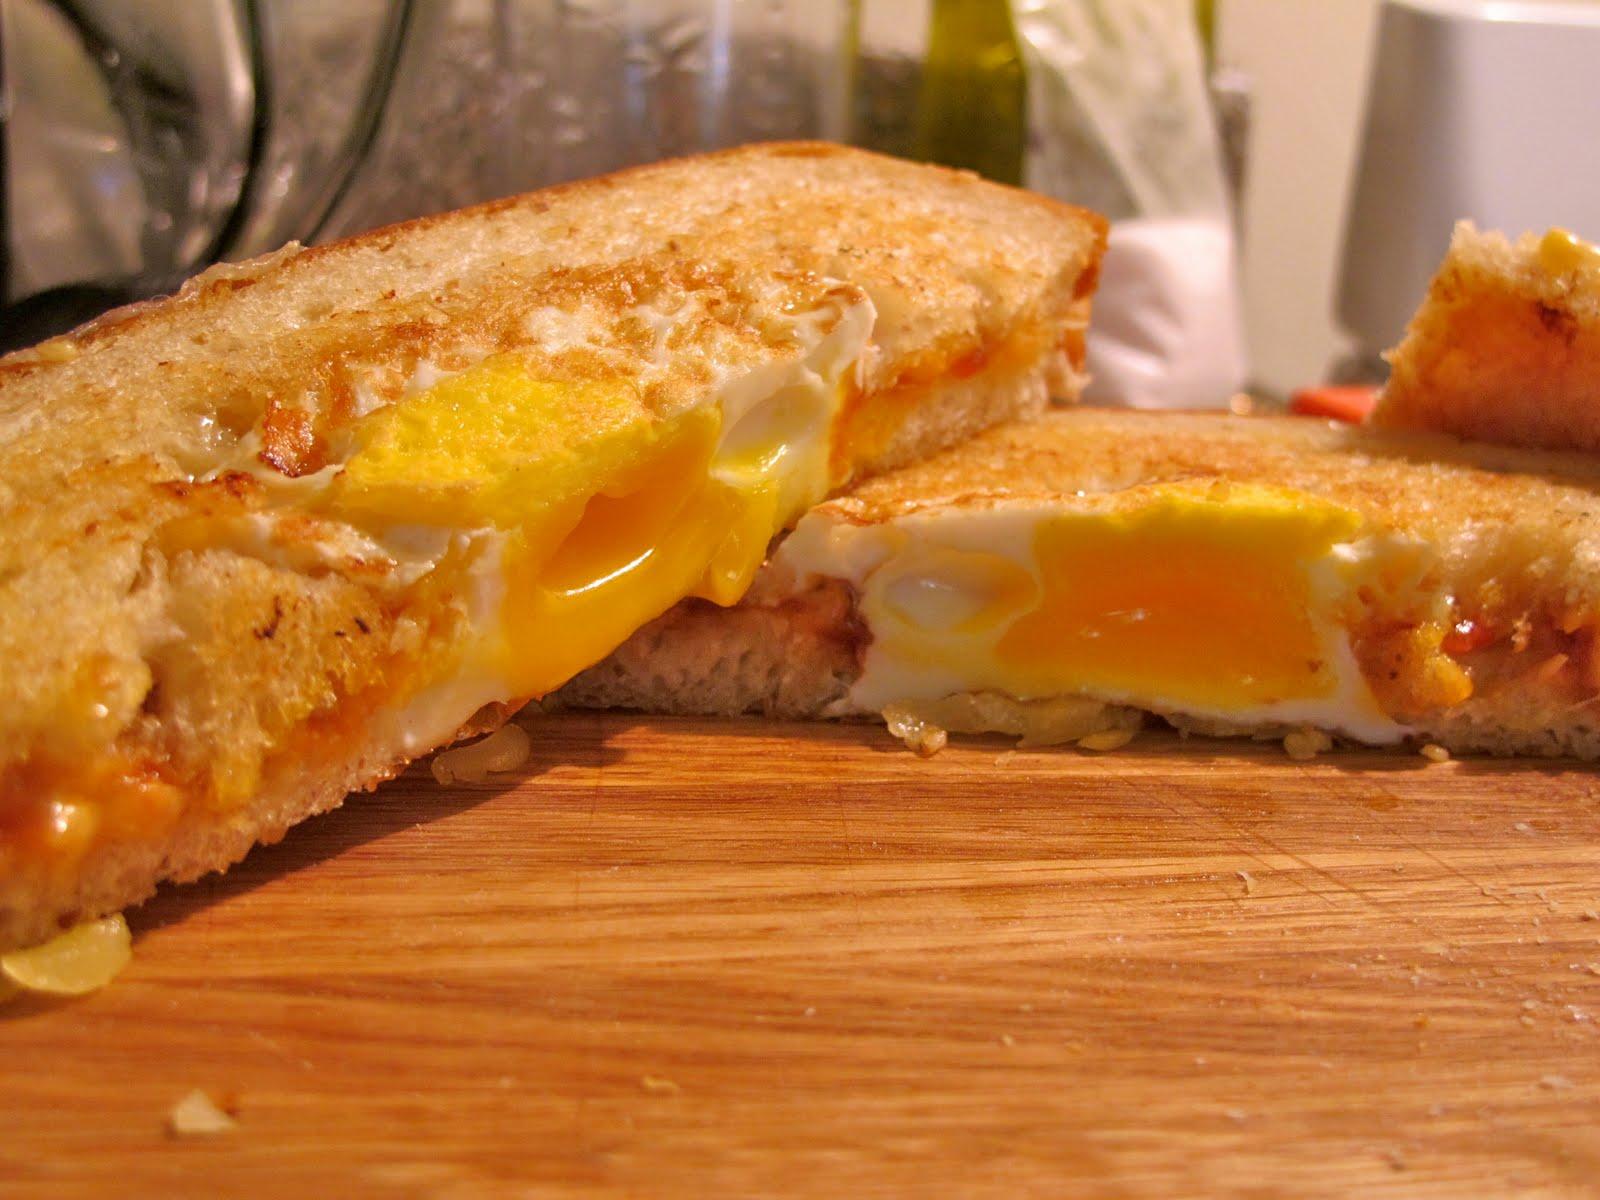 Pkiedrow's dream cheeeeee - Gruyere, Egg, and Tomato Chutney Grilled ...